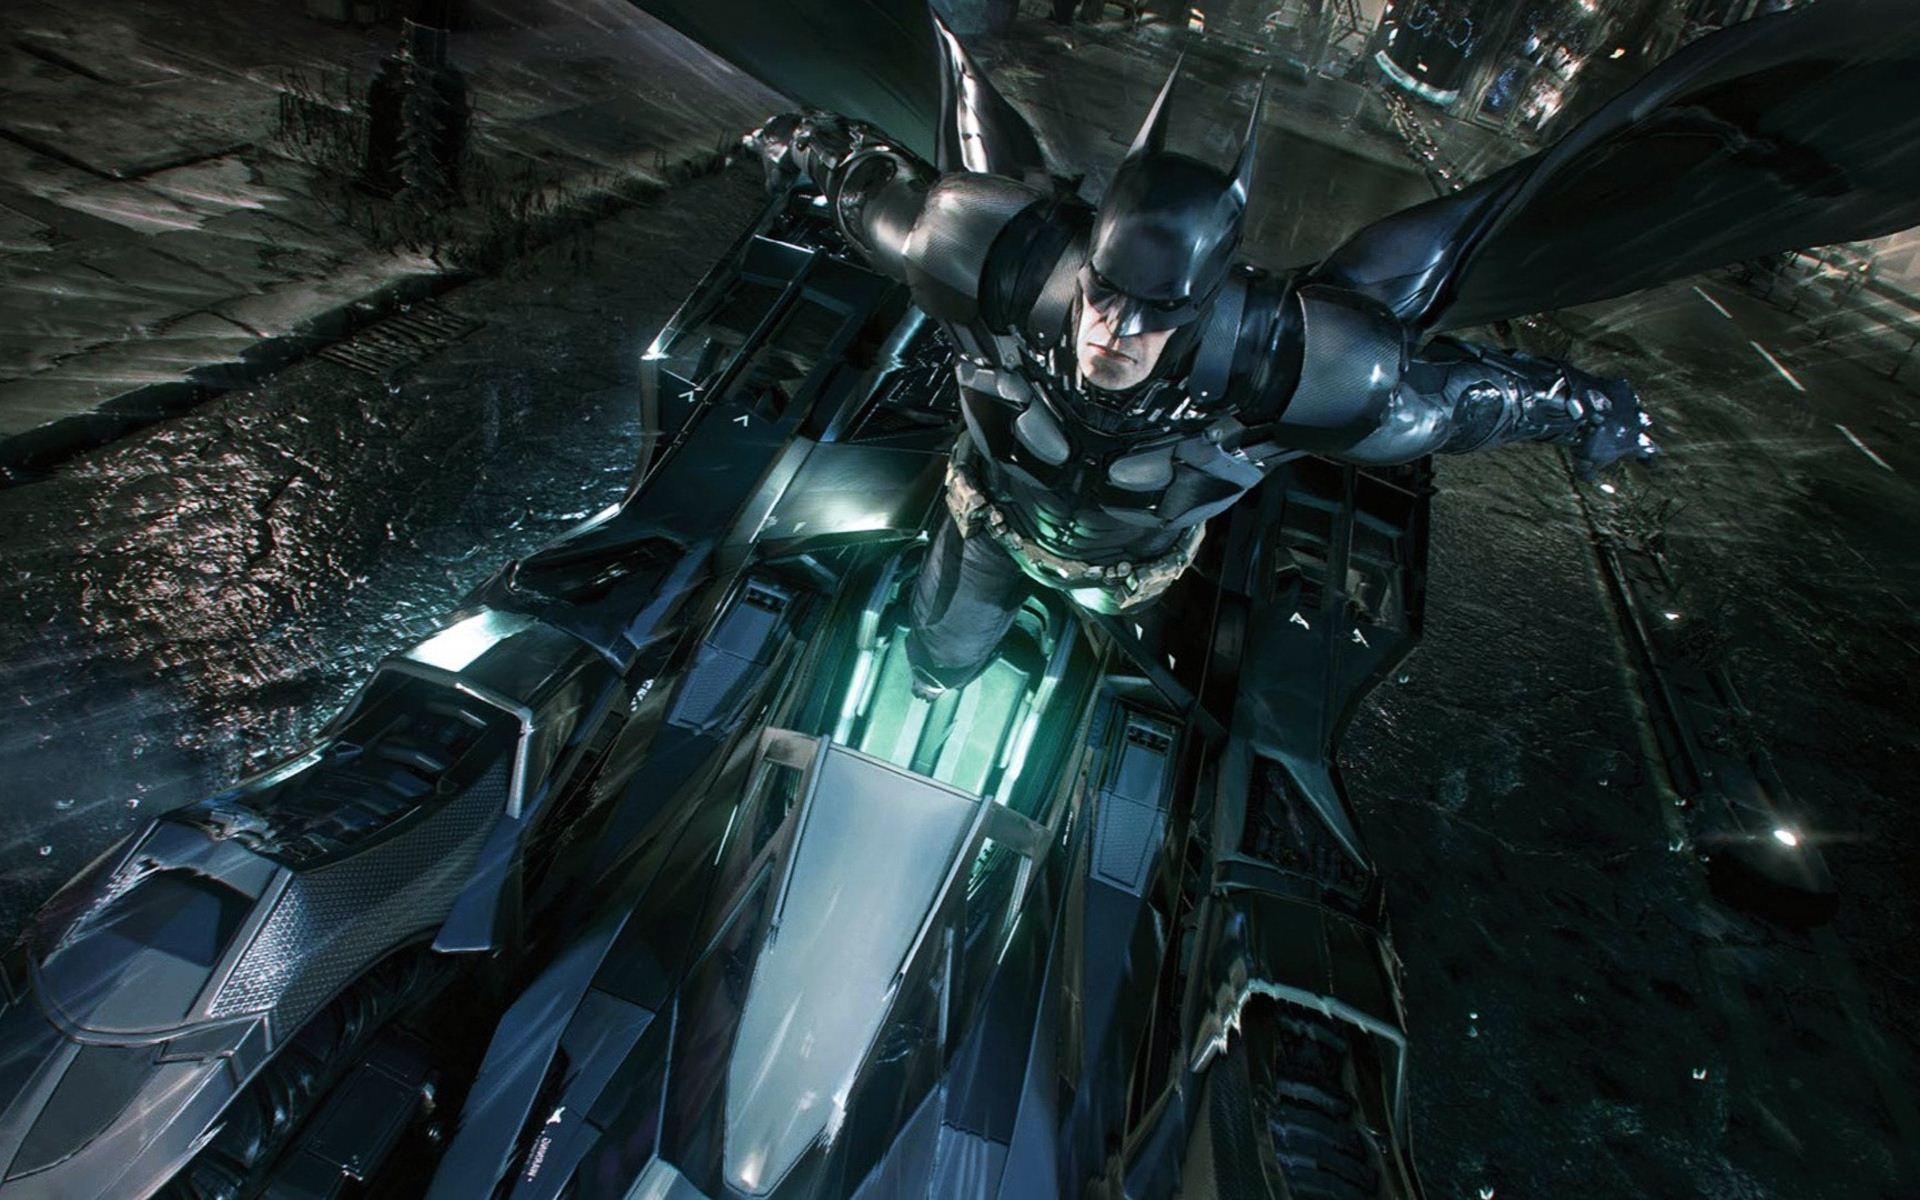 batman-arkham-knight-car-dark-wallpaper